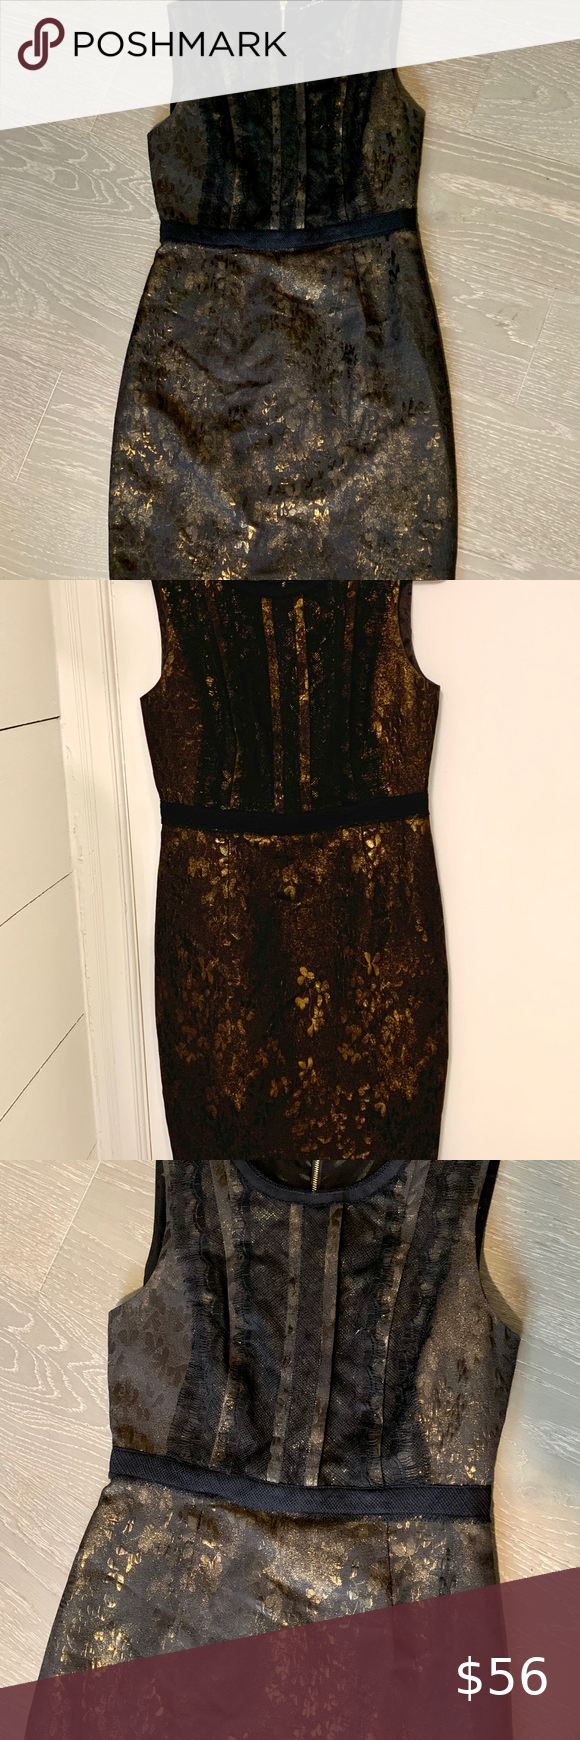 Elie Tahari Black Gold Metallic Sheath Dress Elie Tahari Elie Tahari Dresses Tahari [ 1740 x 580 Pixel ]